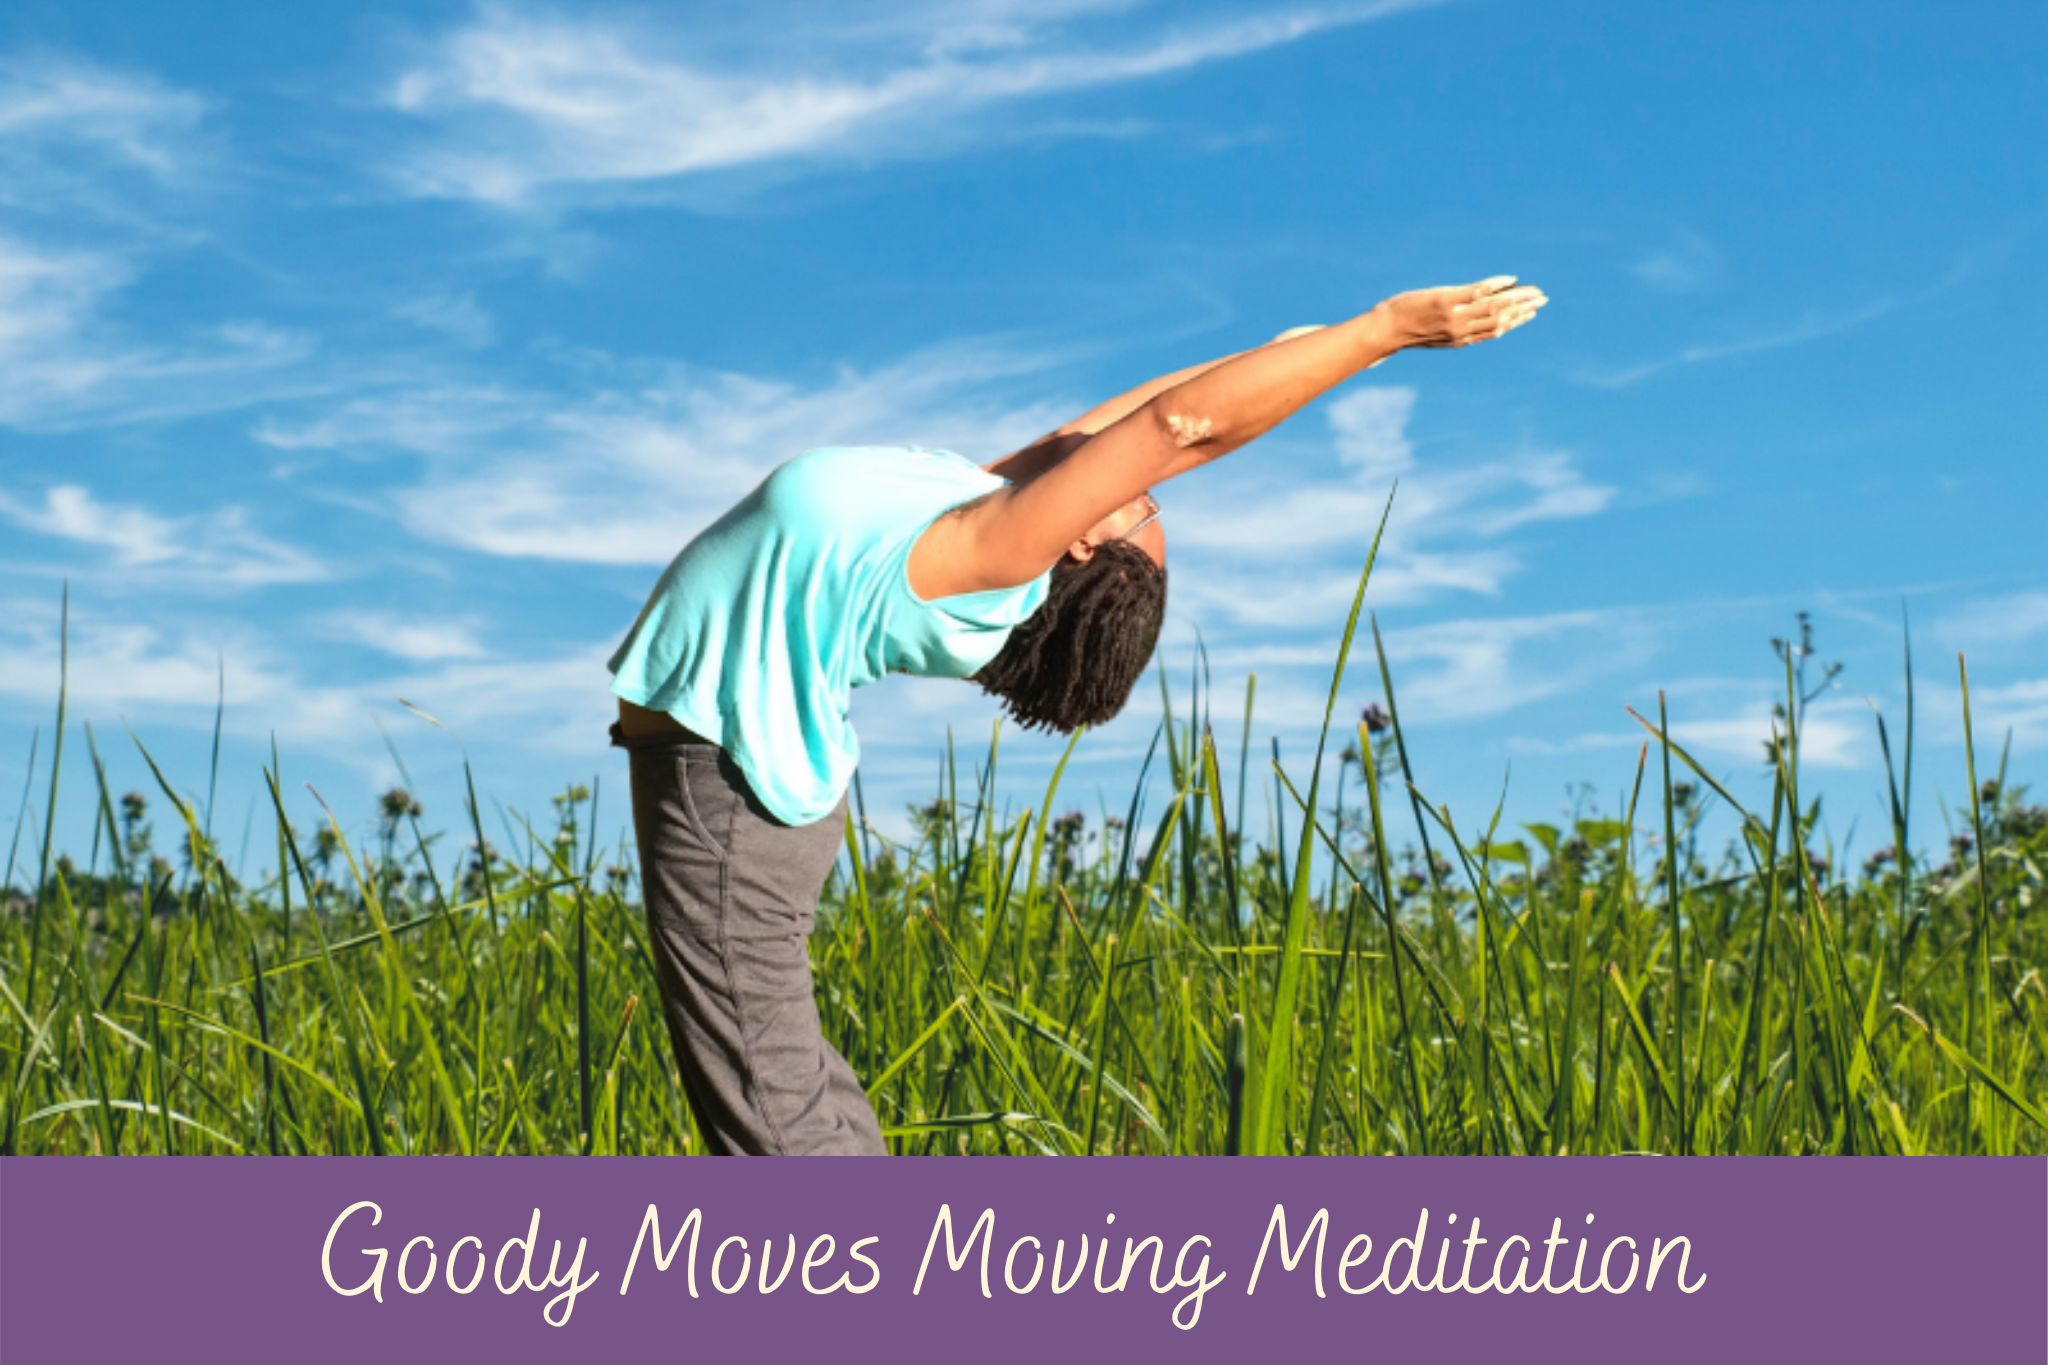 Goody Moves Meditation